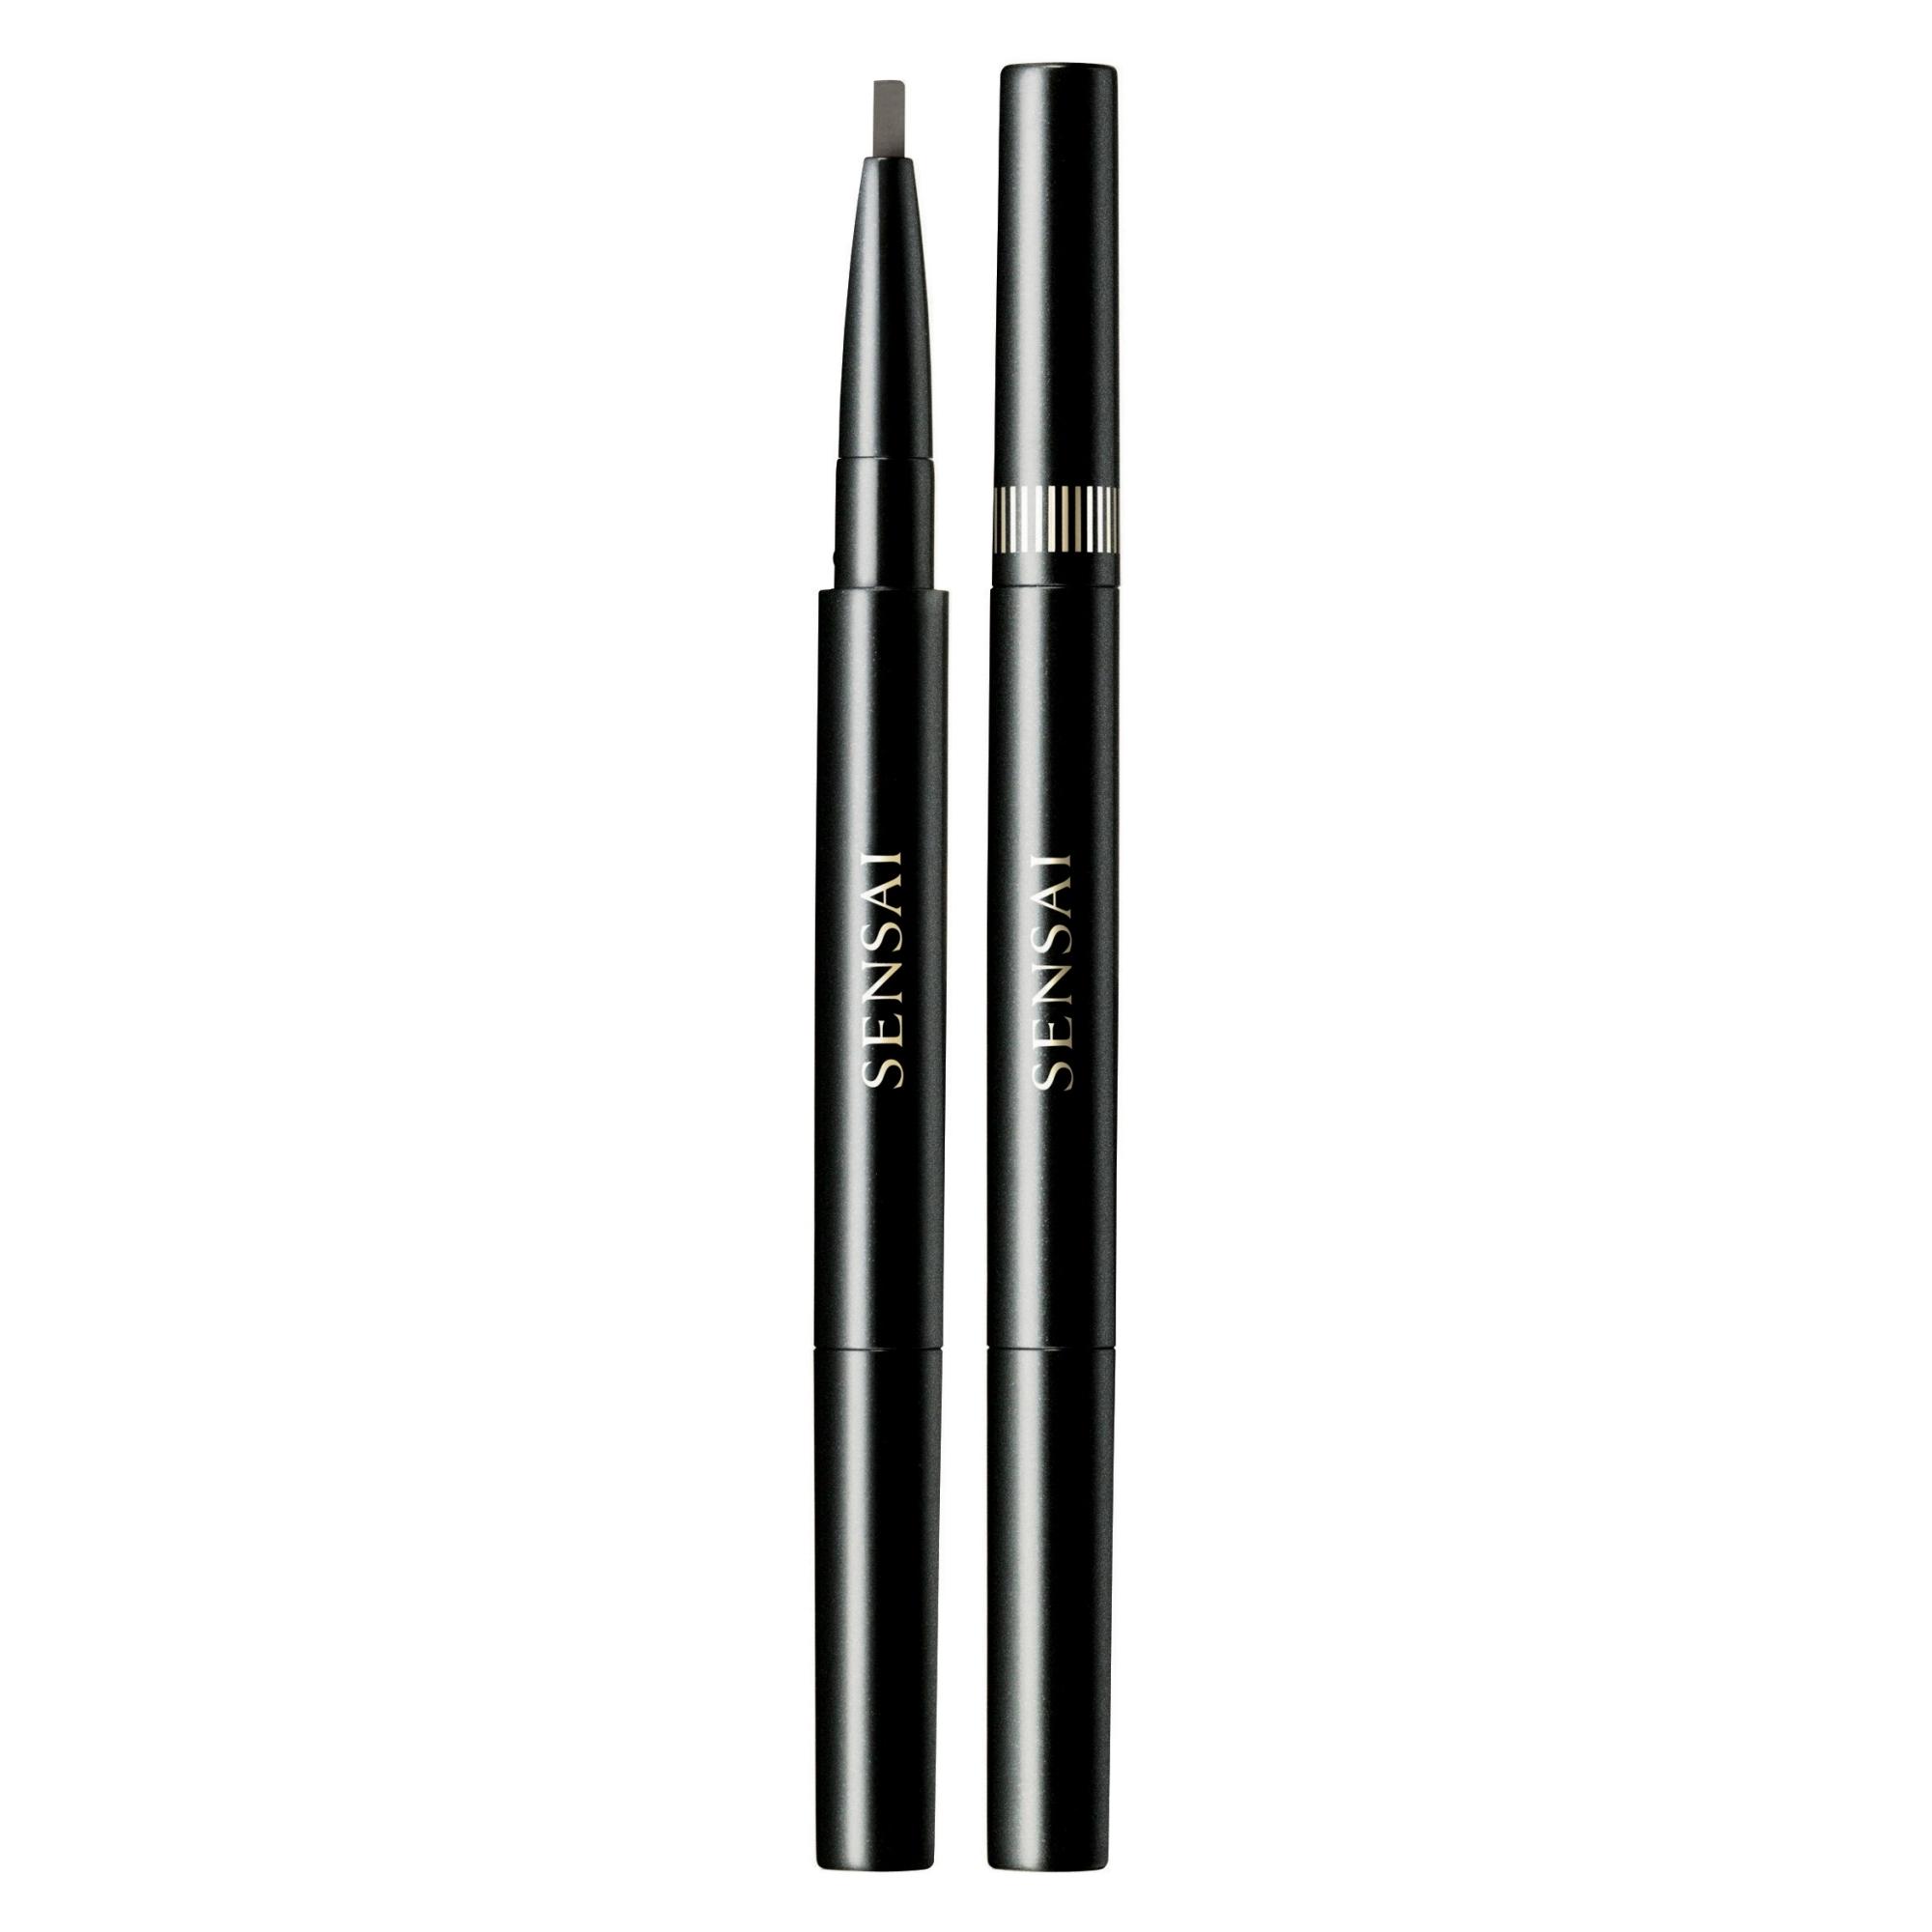 Eyebrow Pencil 01 Greyish Brown